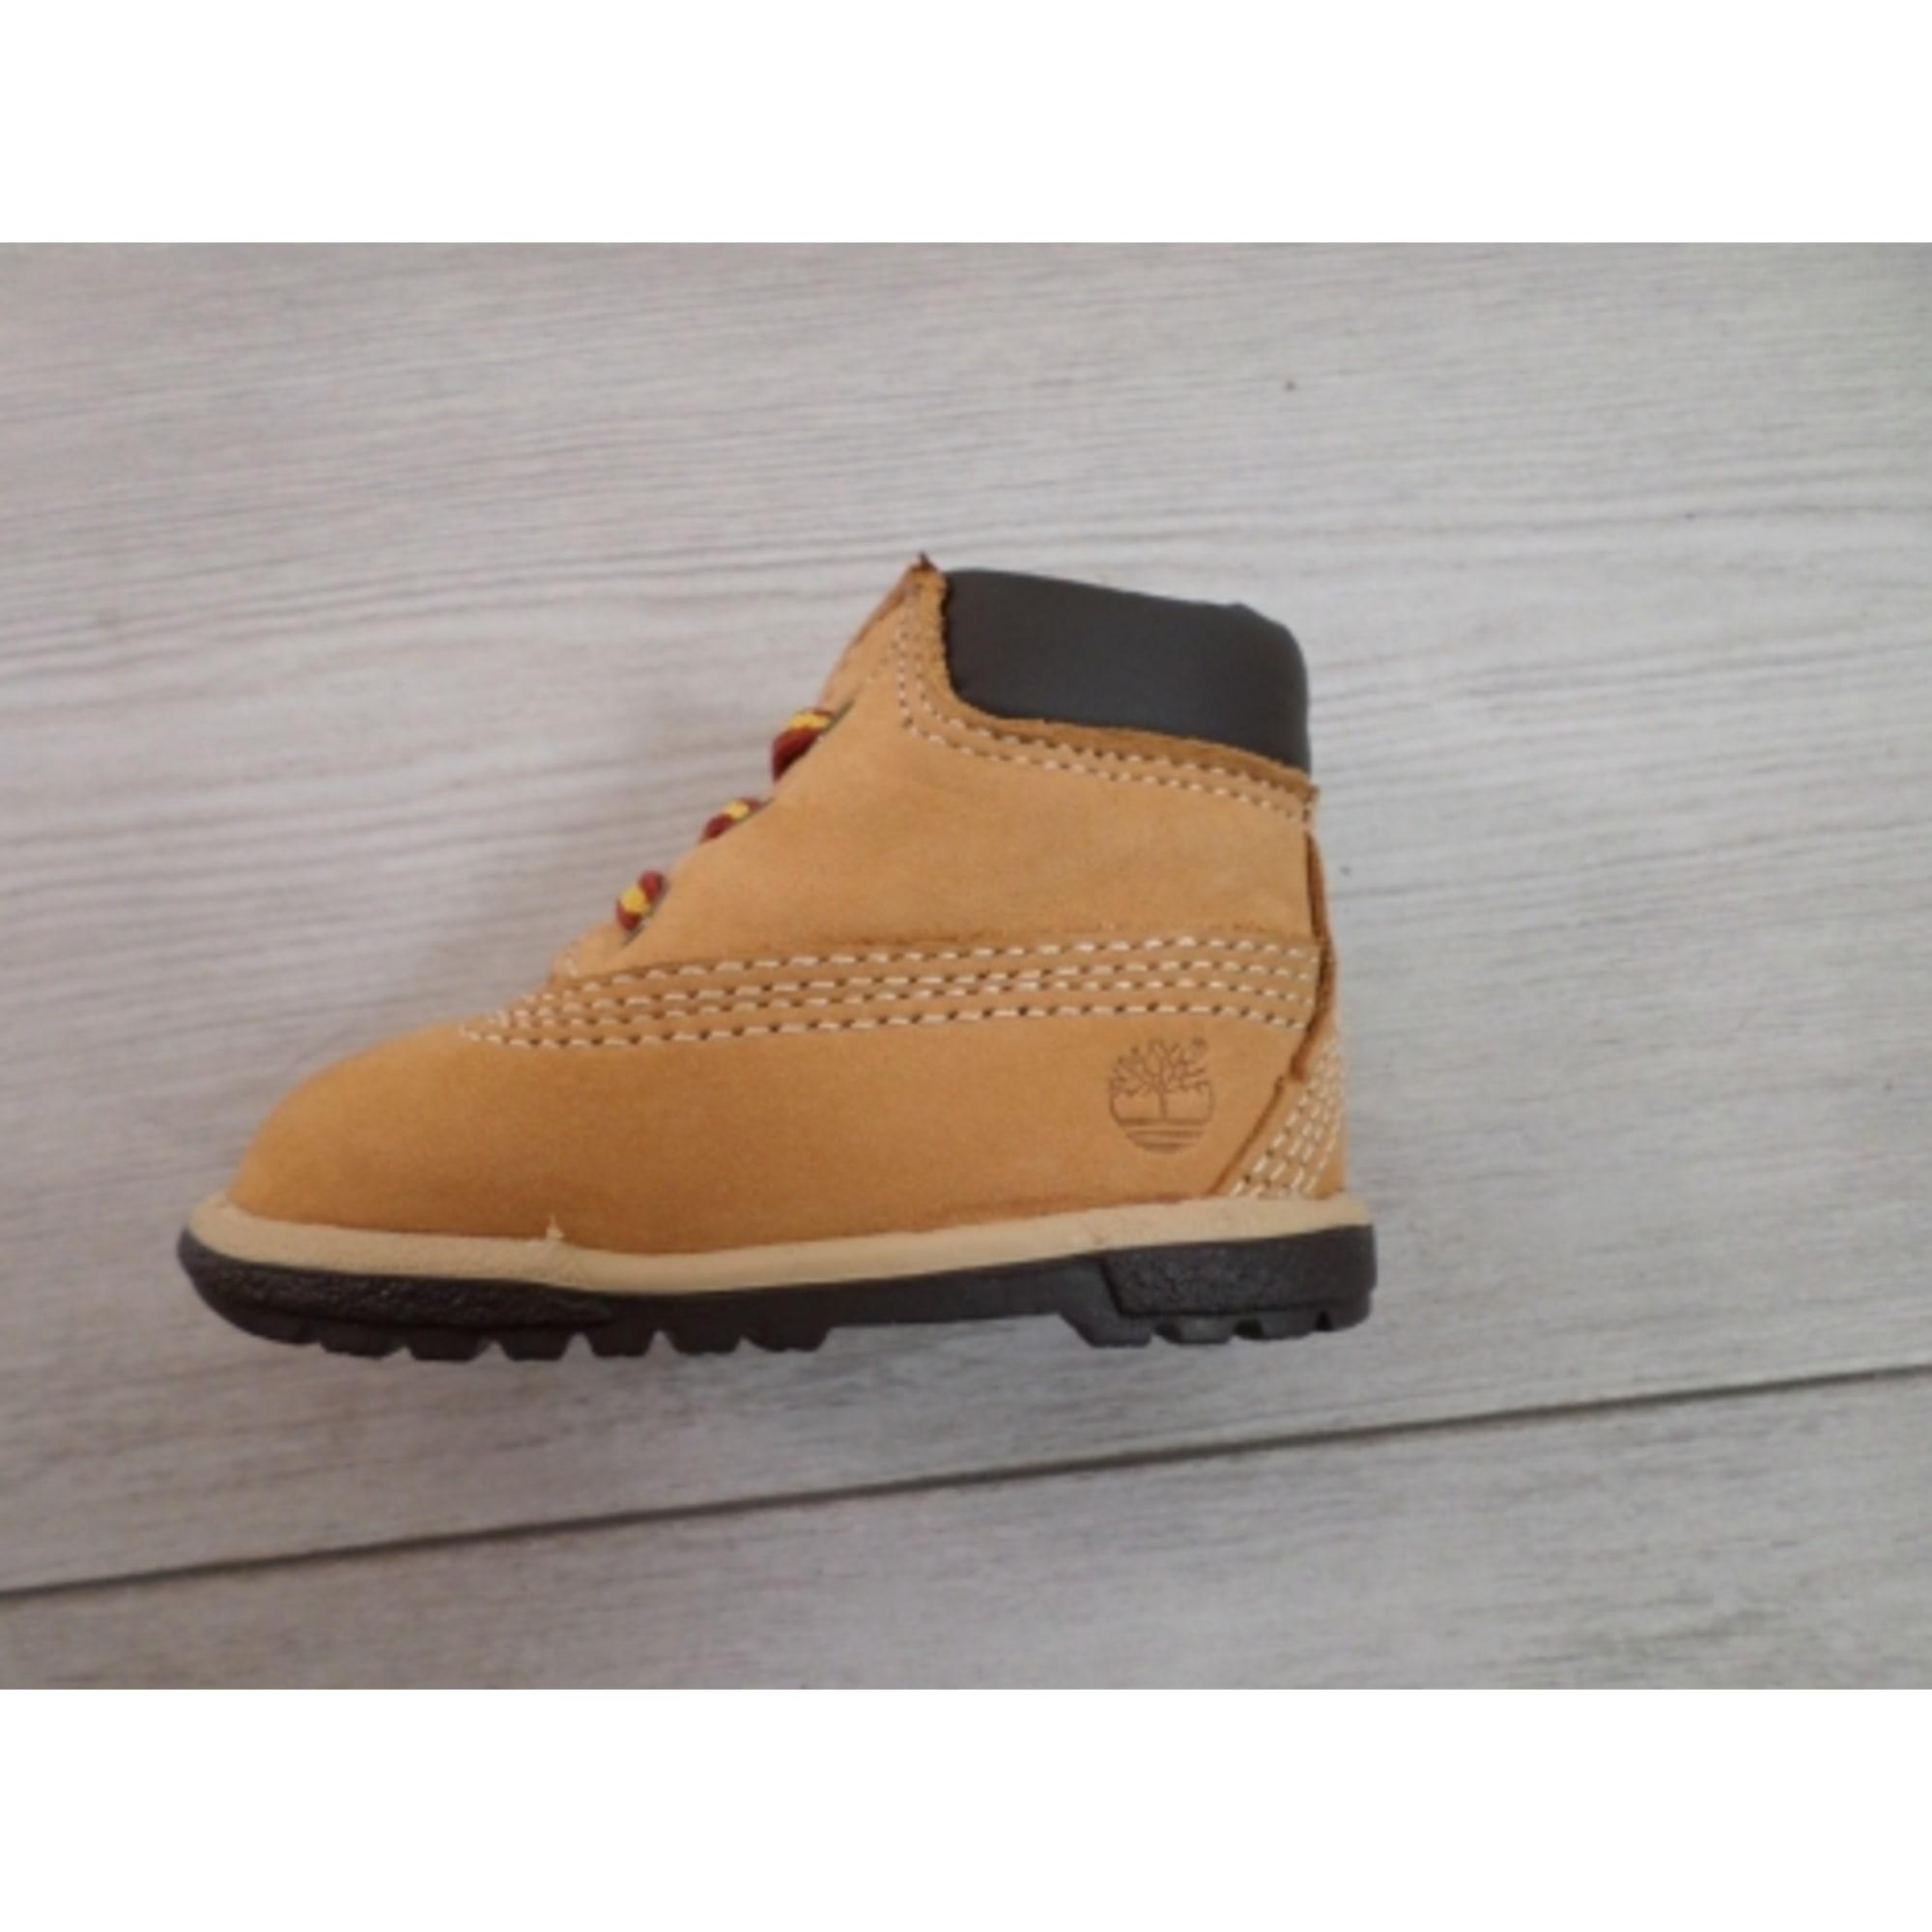 Lace Up Shoes TIMBERLAND Orange